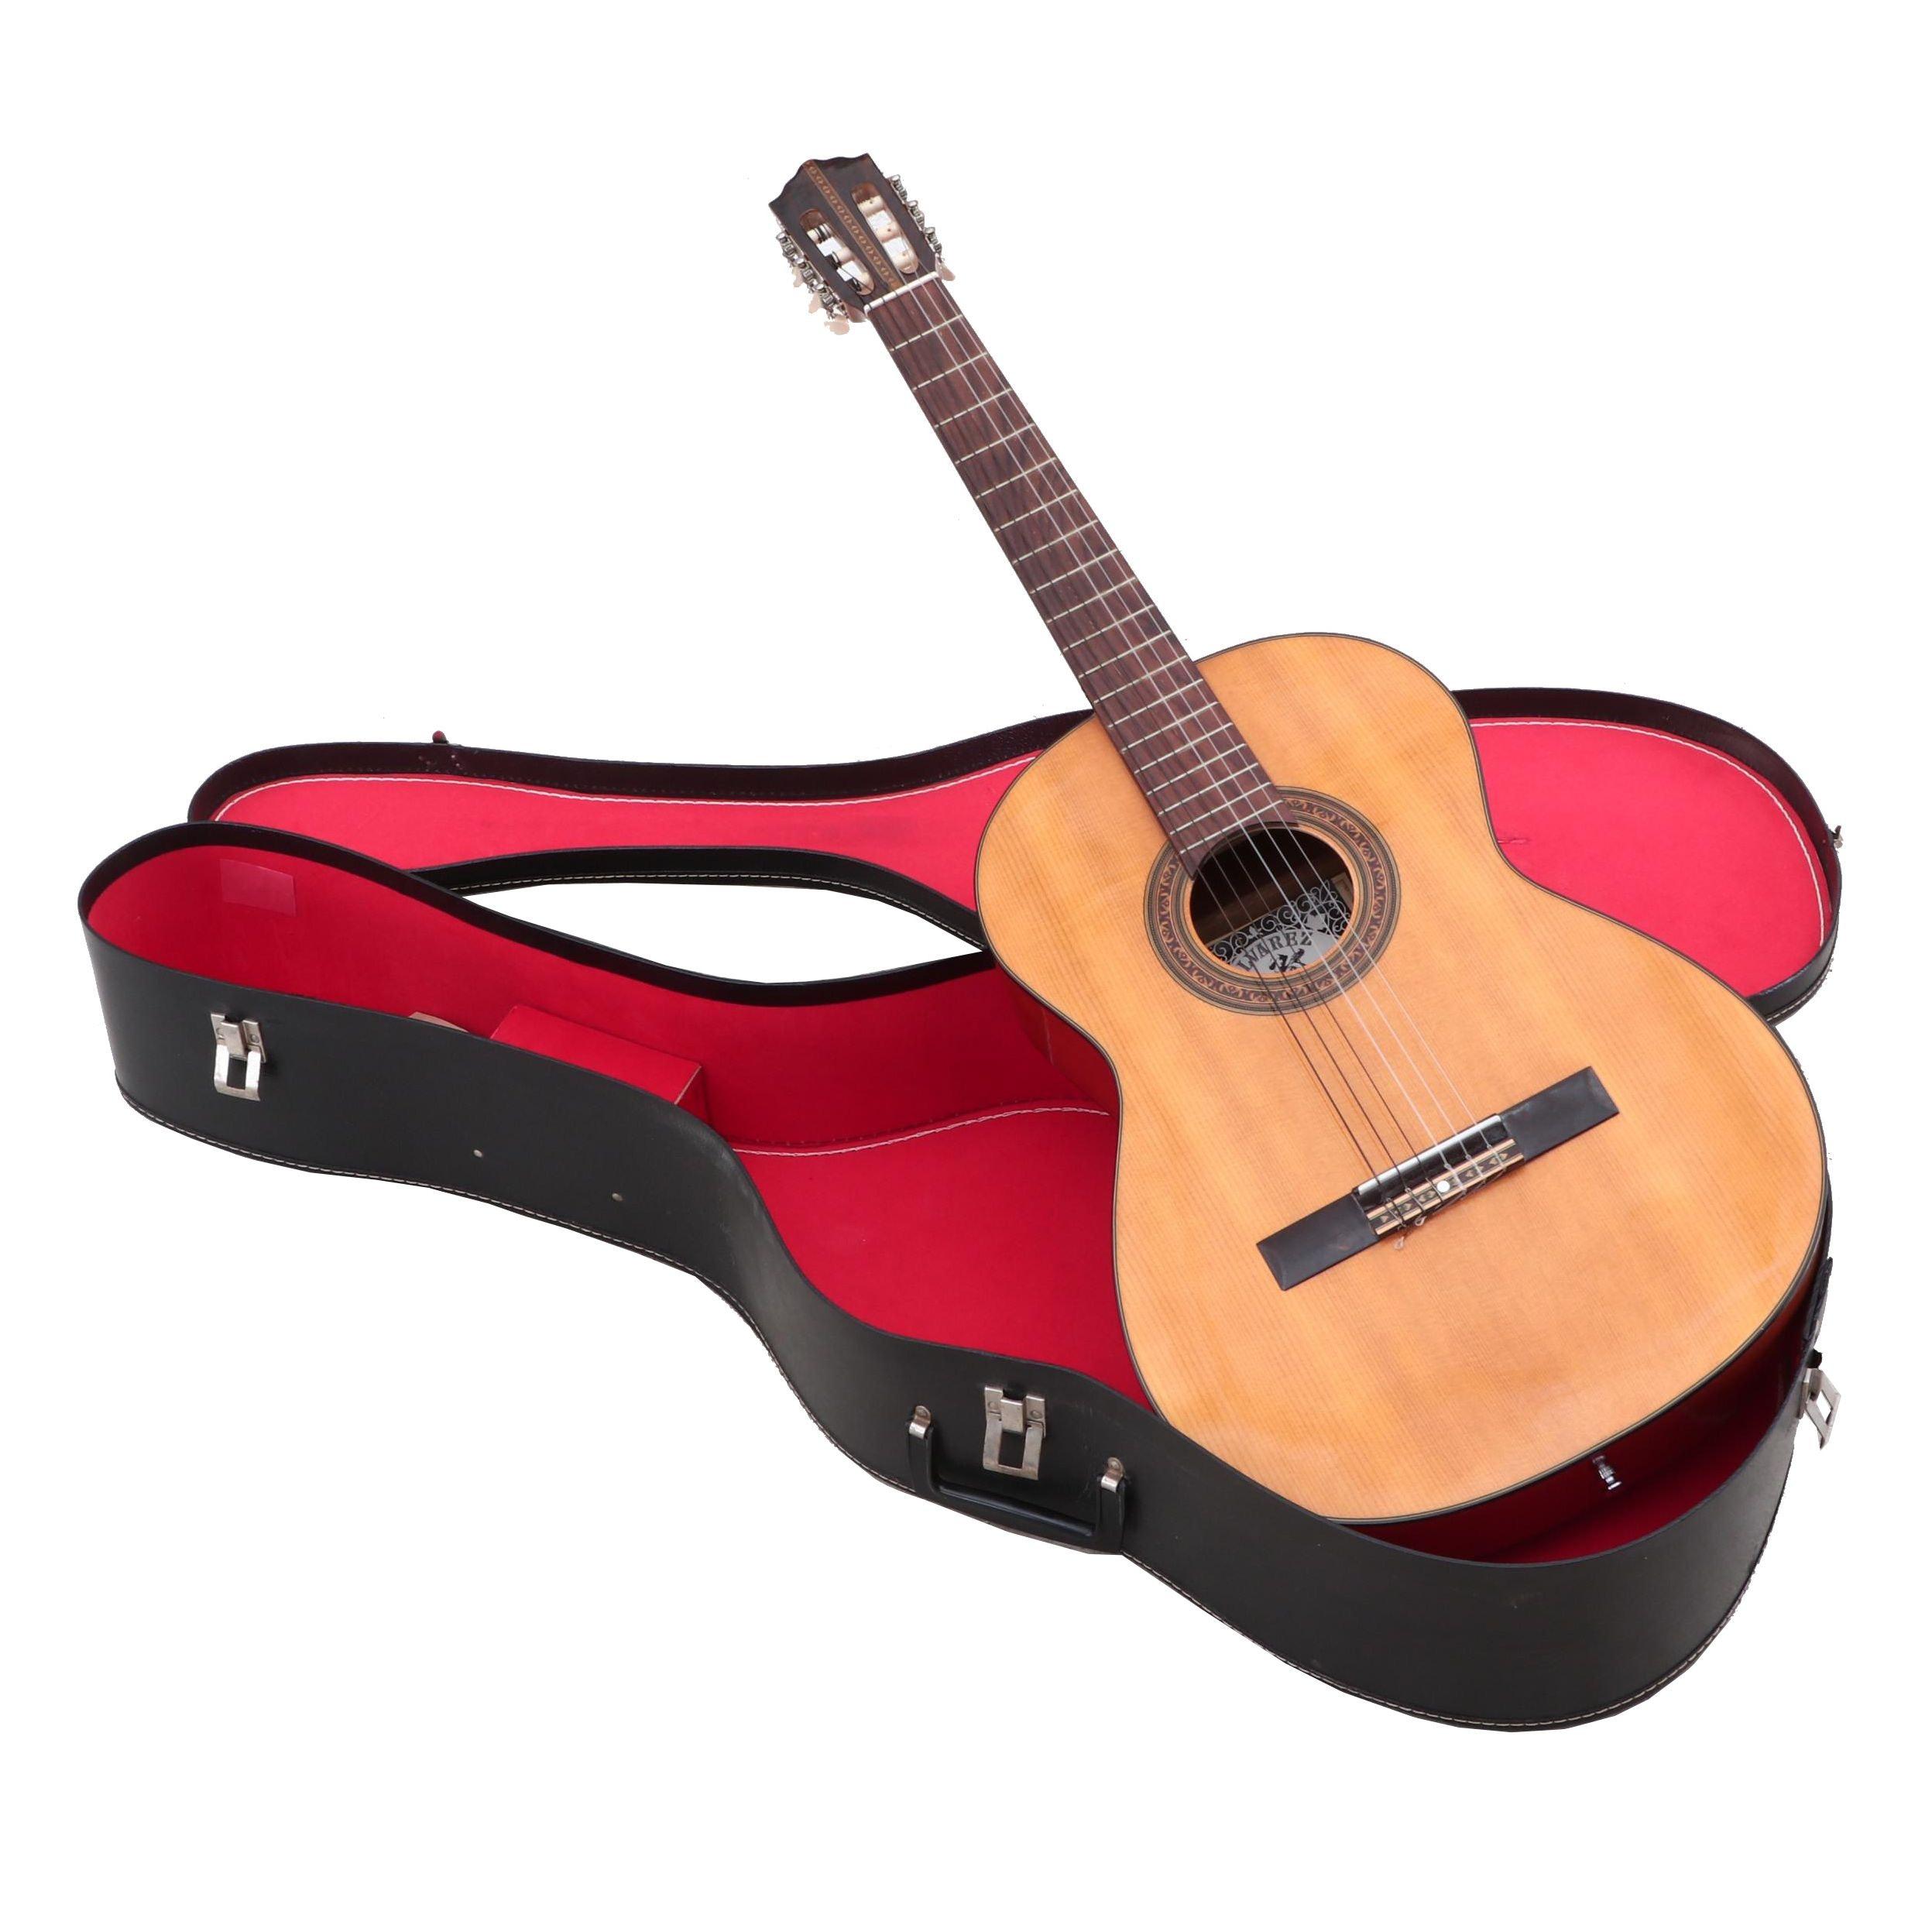 Vintage Alvarez 5011 Classical Acoustic Guitar with Carrying Case, 1970s